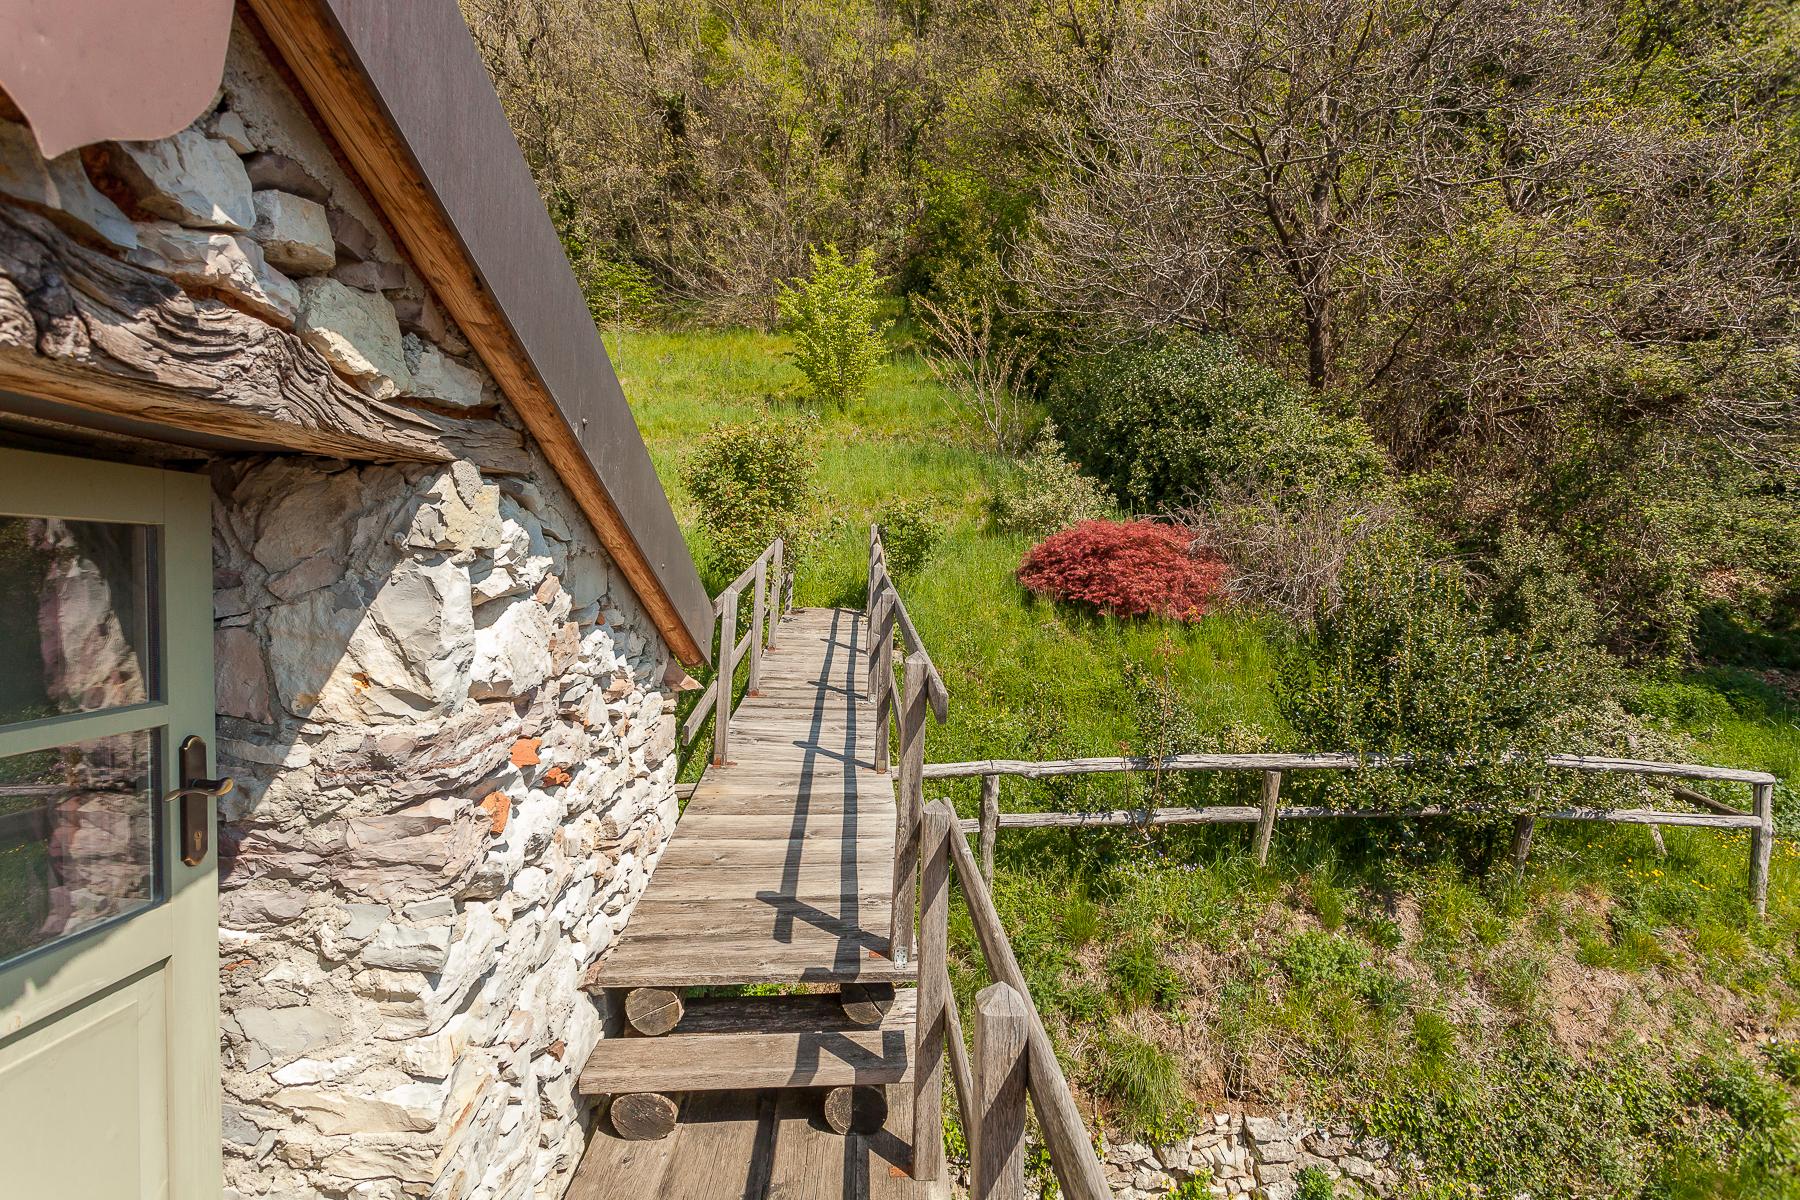 Casa indipendente in Vendita a Caprino Bergamasco: 5 locali, 500 mq - Foto 14